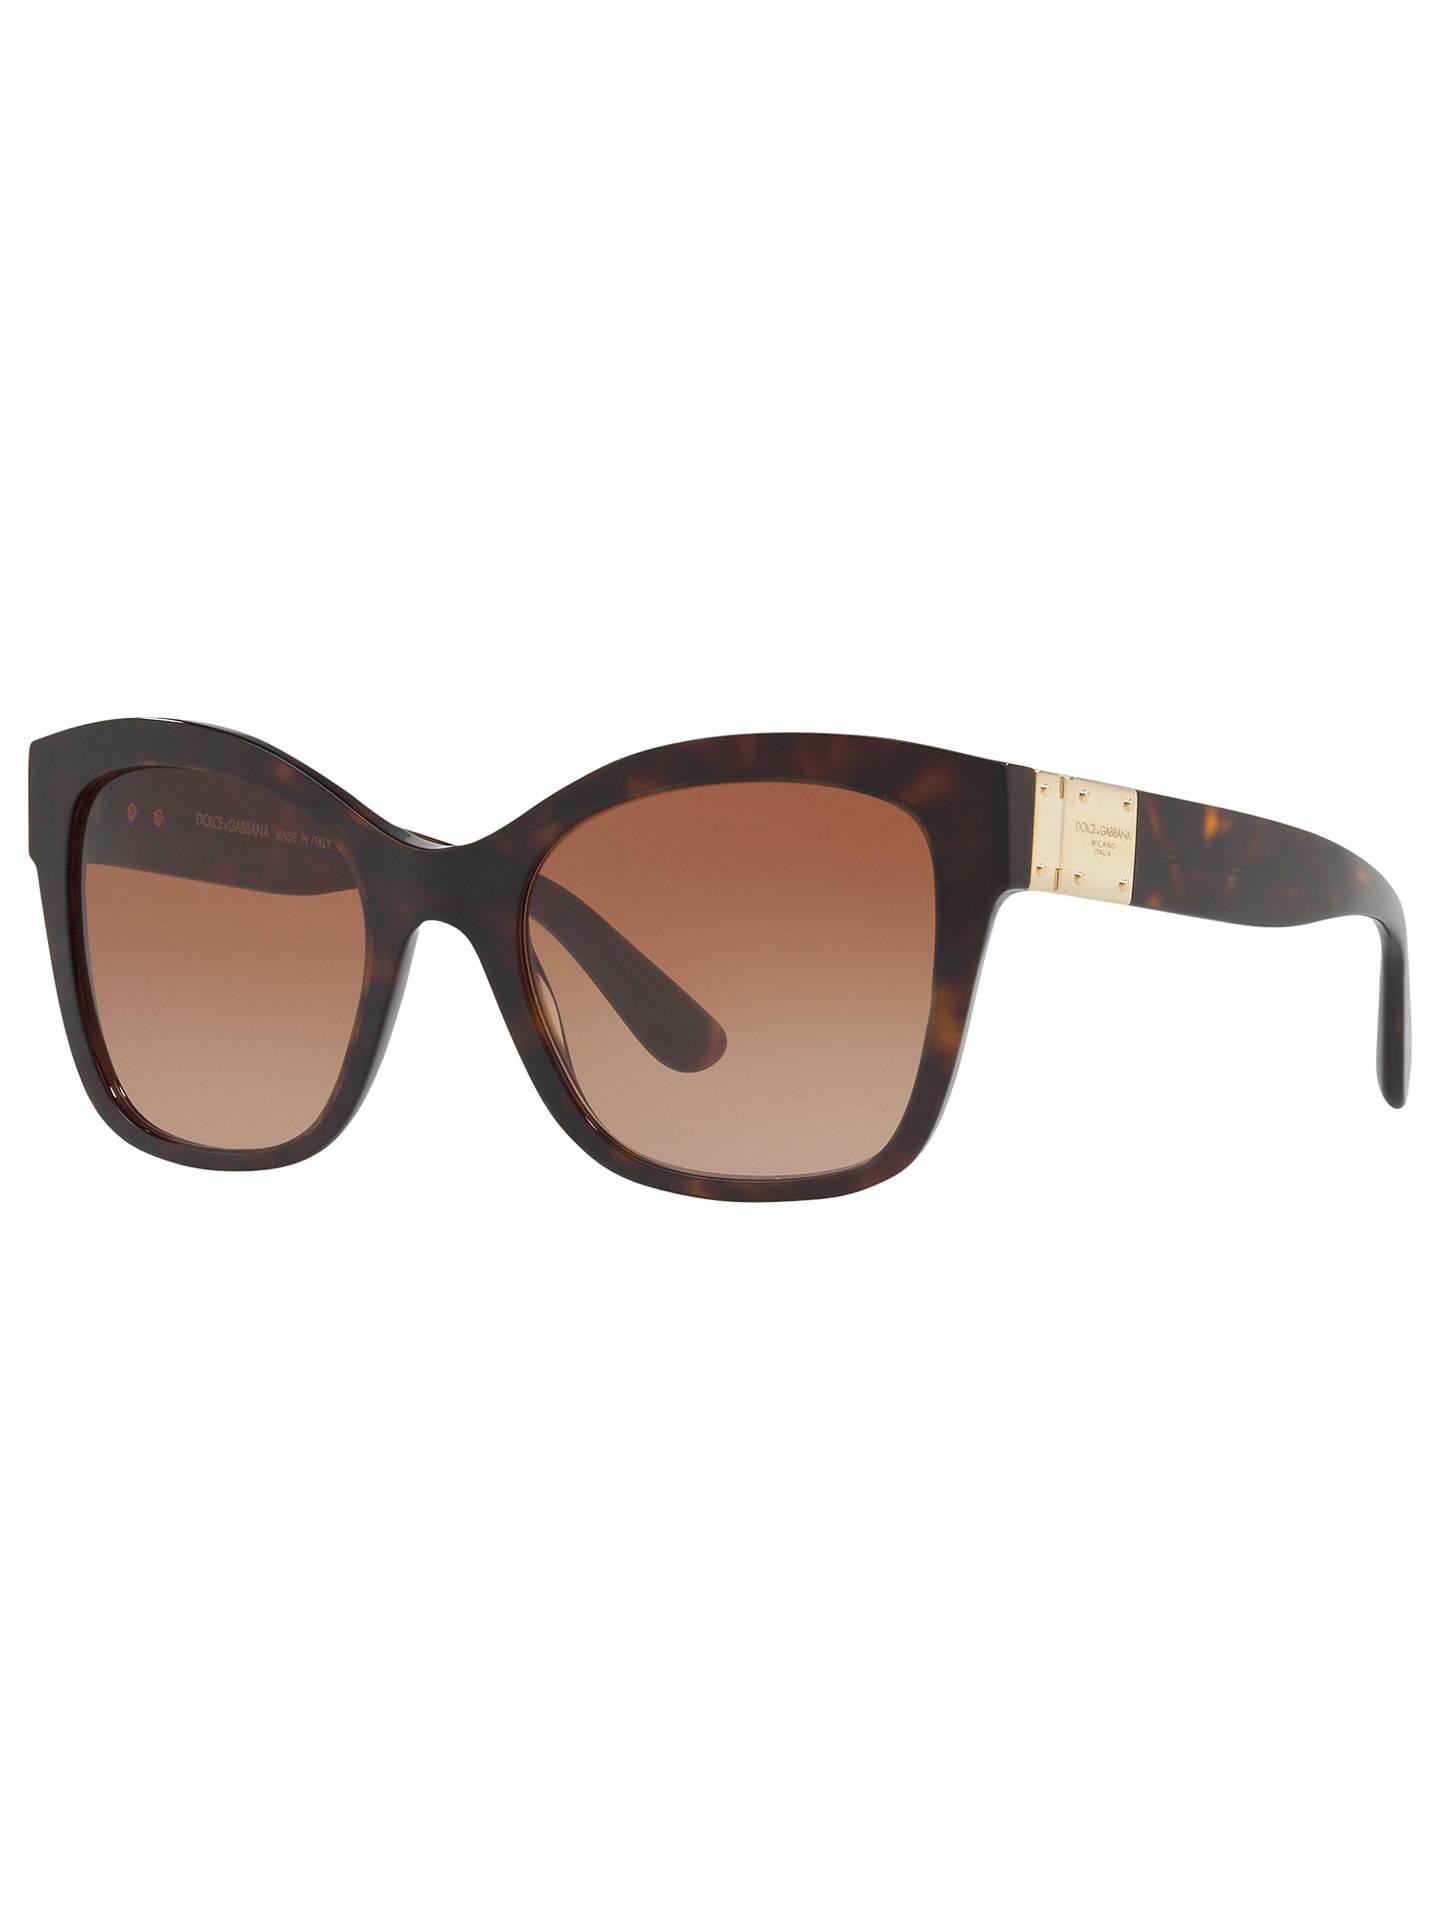 1042badf49e Buy Dolce   Gabbana DG4309 Square Sunglasses